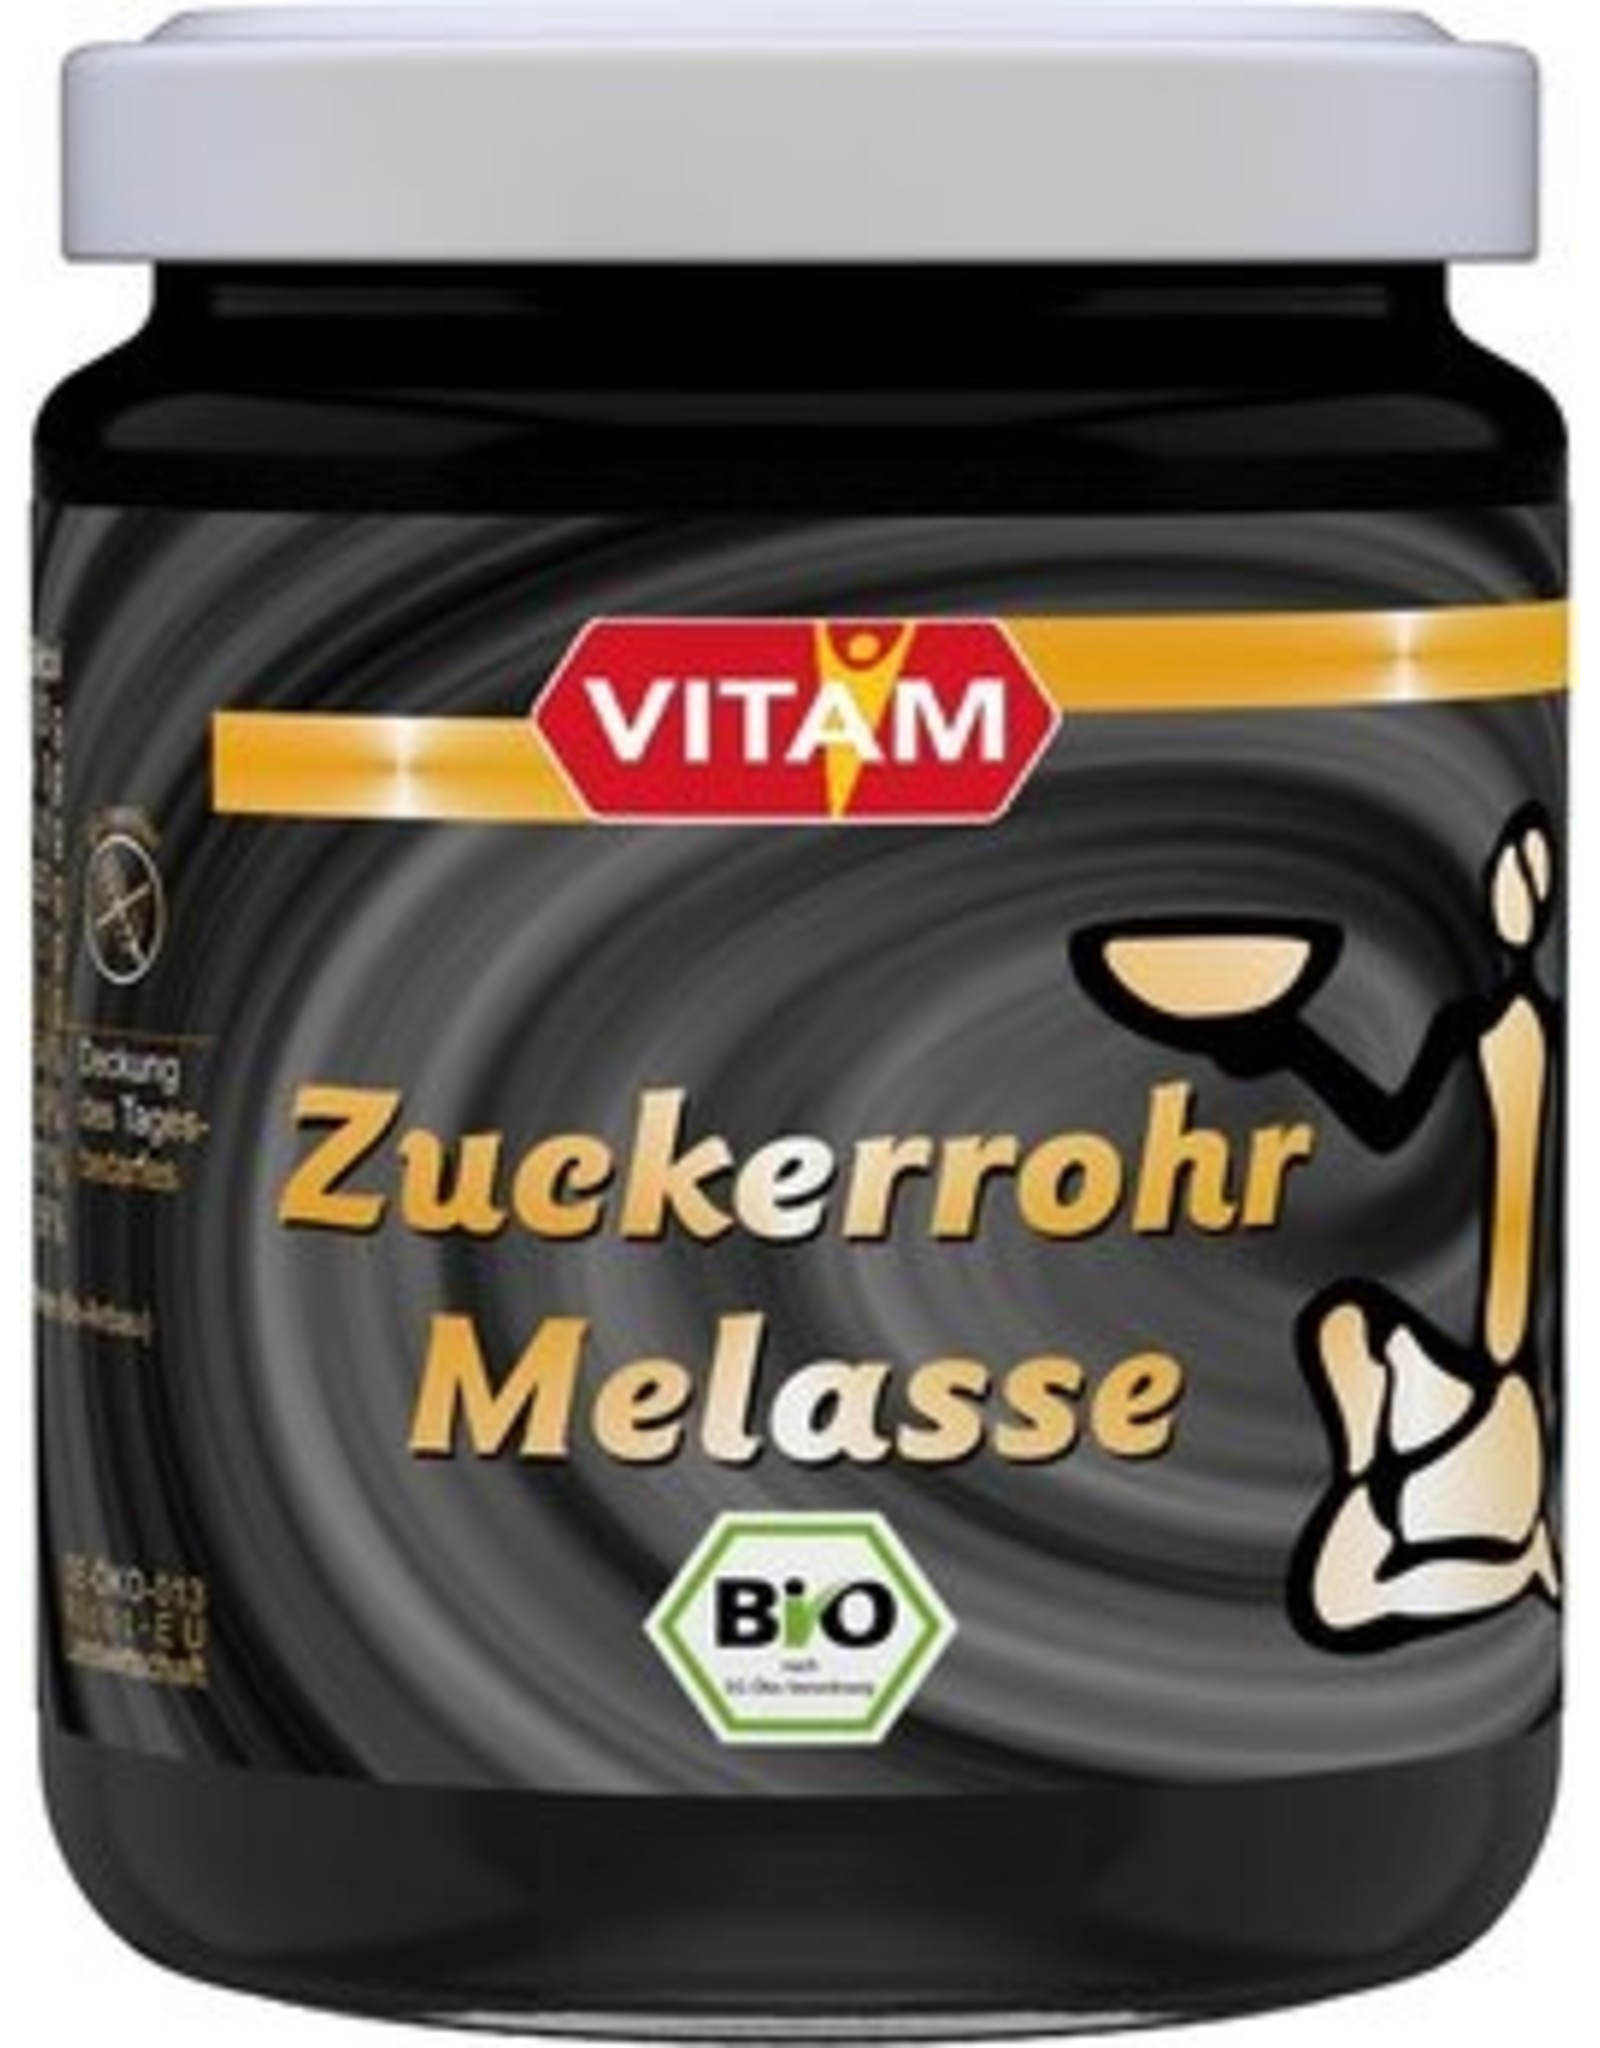 VITAM Appleford's Zuckerrohr Bio-Melasse 300g